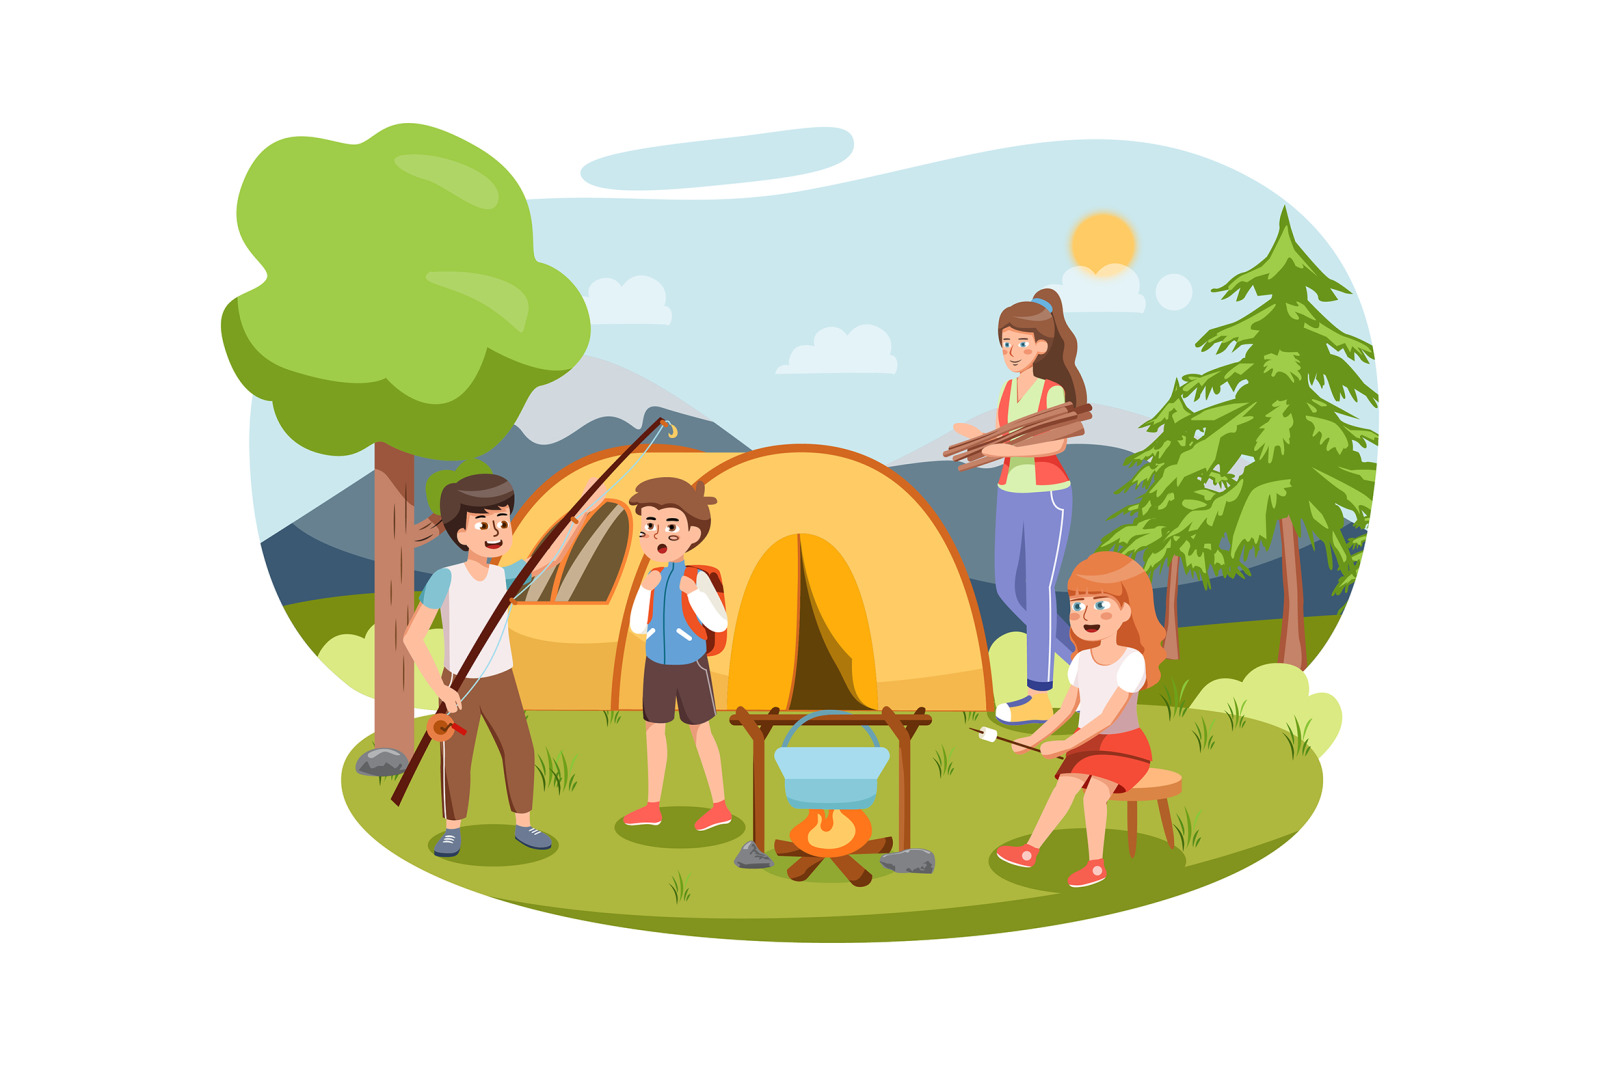 M157_Kindergarten Illustrations